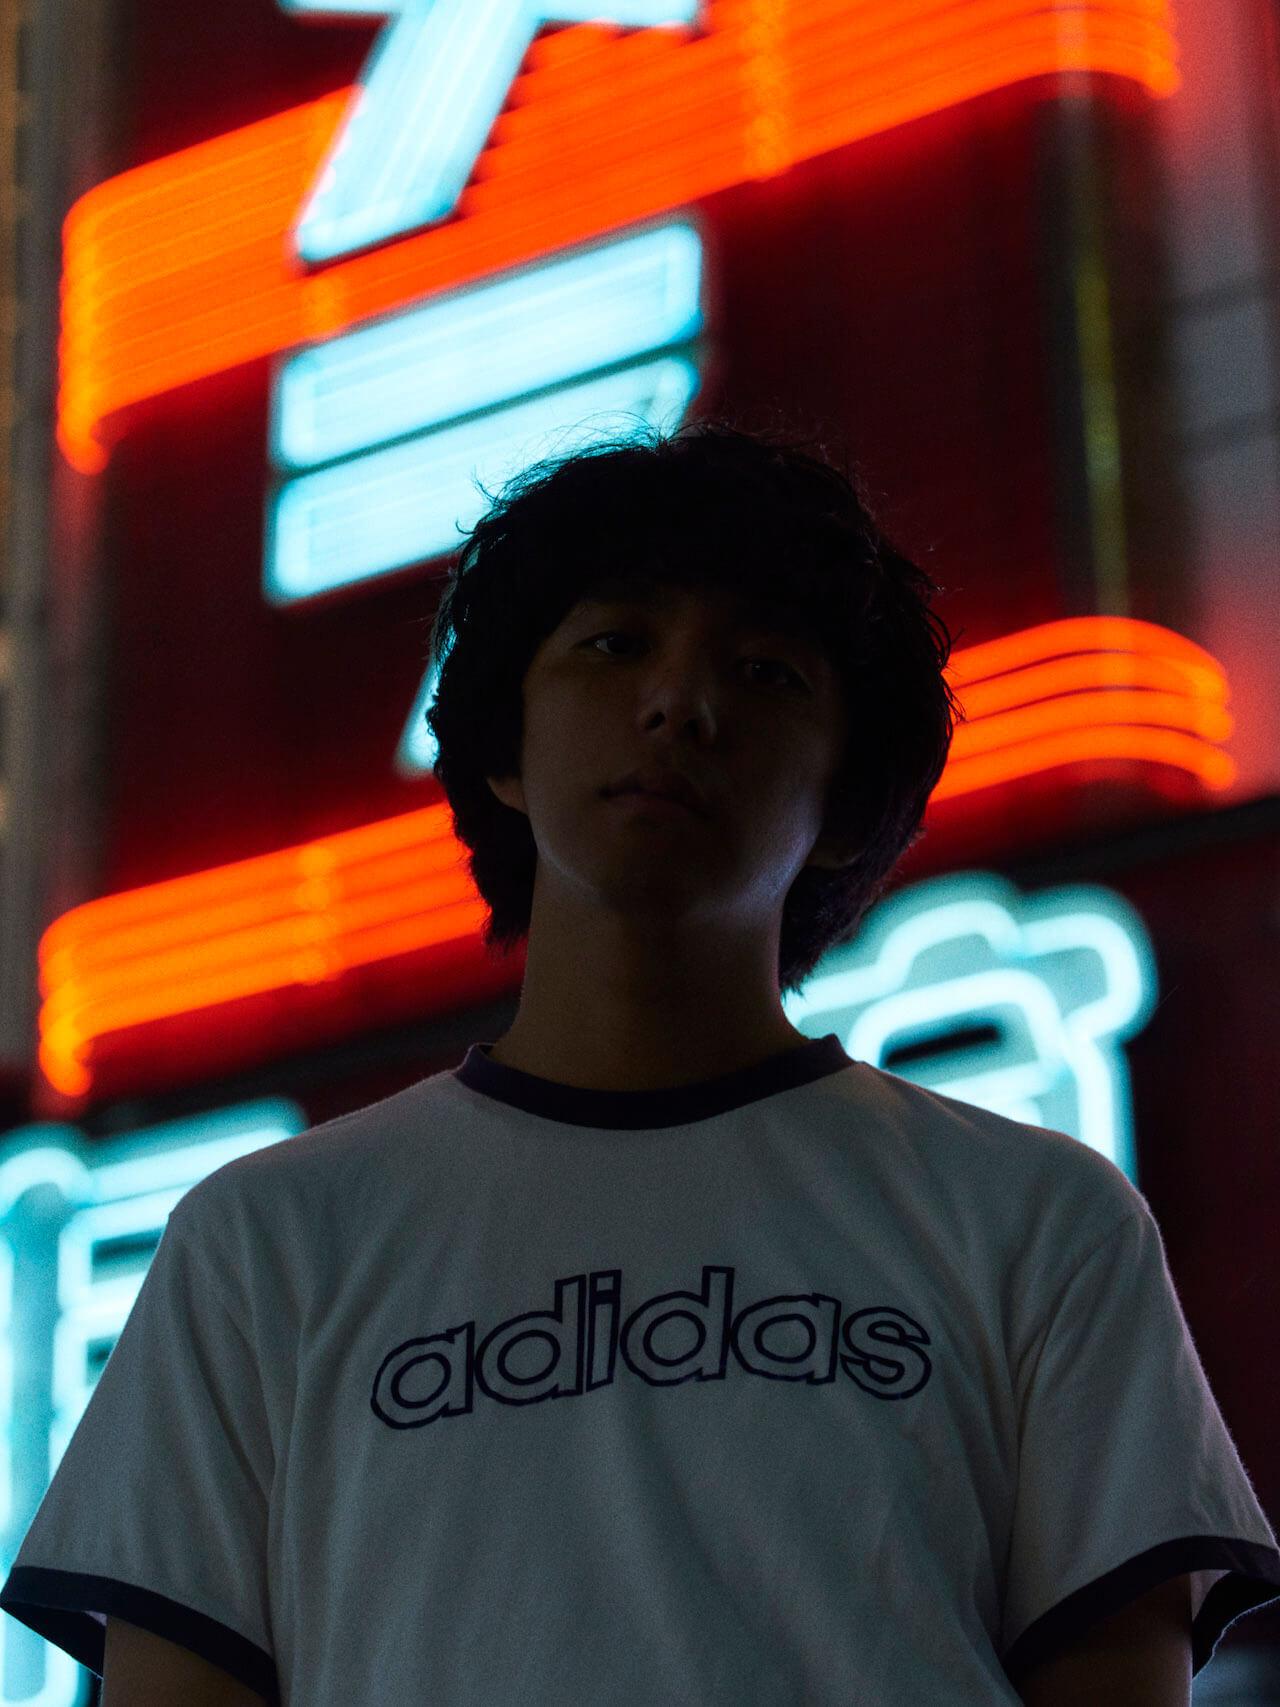 TENDOUJI×フジロック|東京オルタナシーン屈指の愛されバンドに訊く、フジロック初出演の意気込み interview190722-tendouji-1